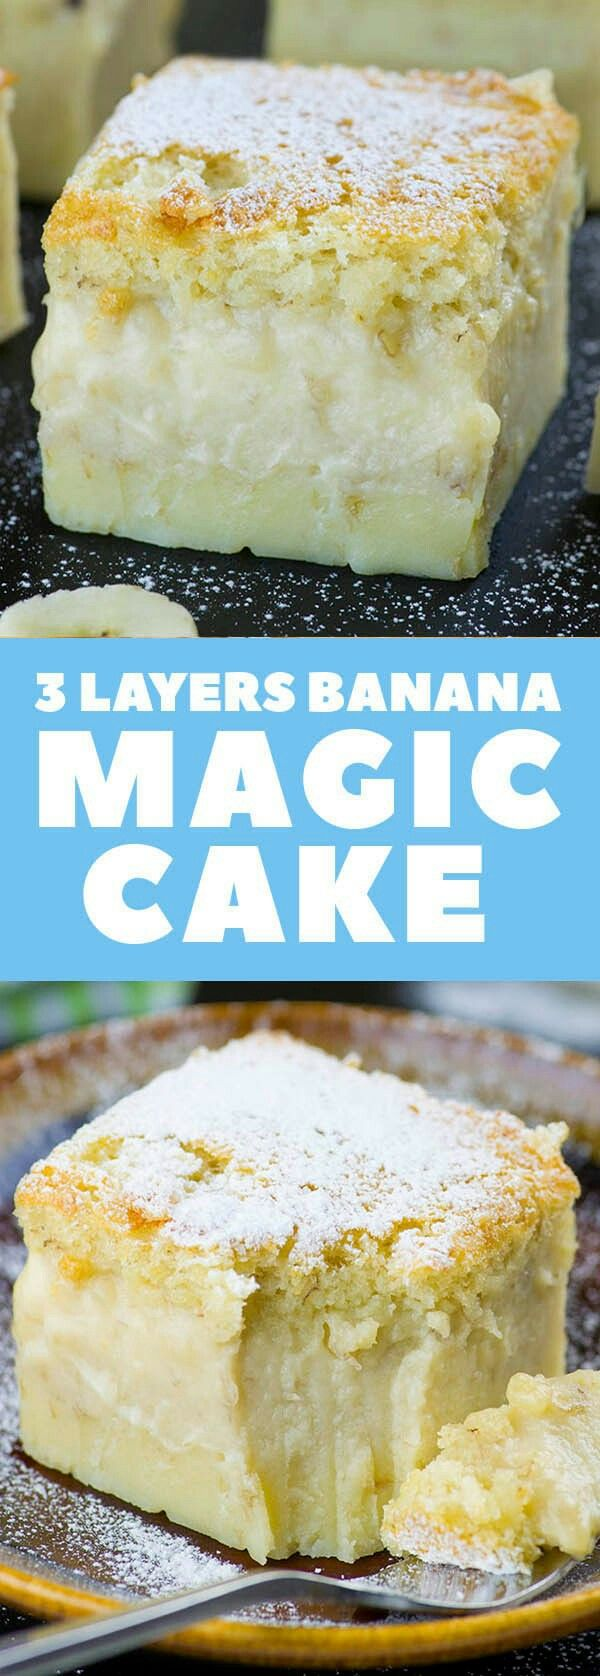 3 layers banana magic cake